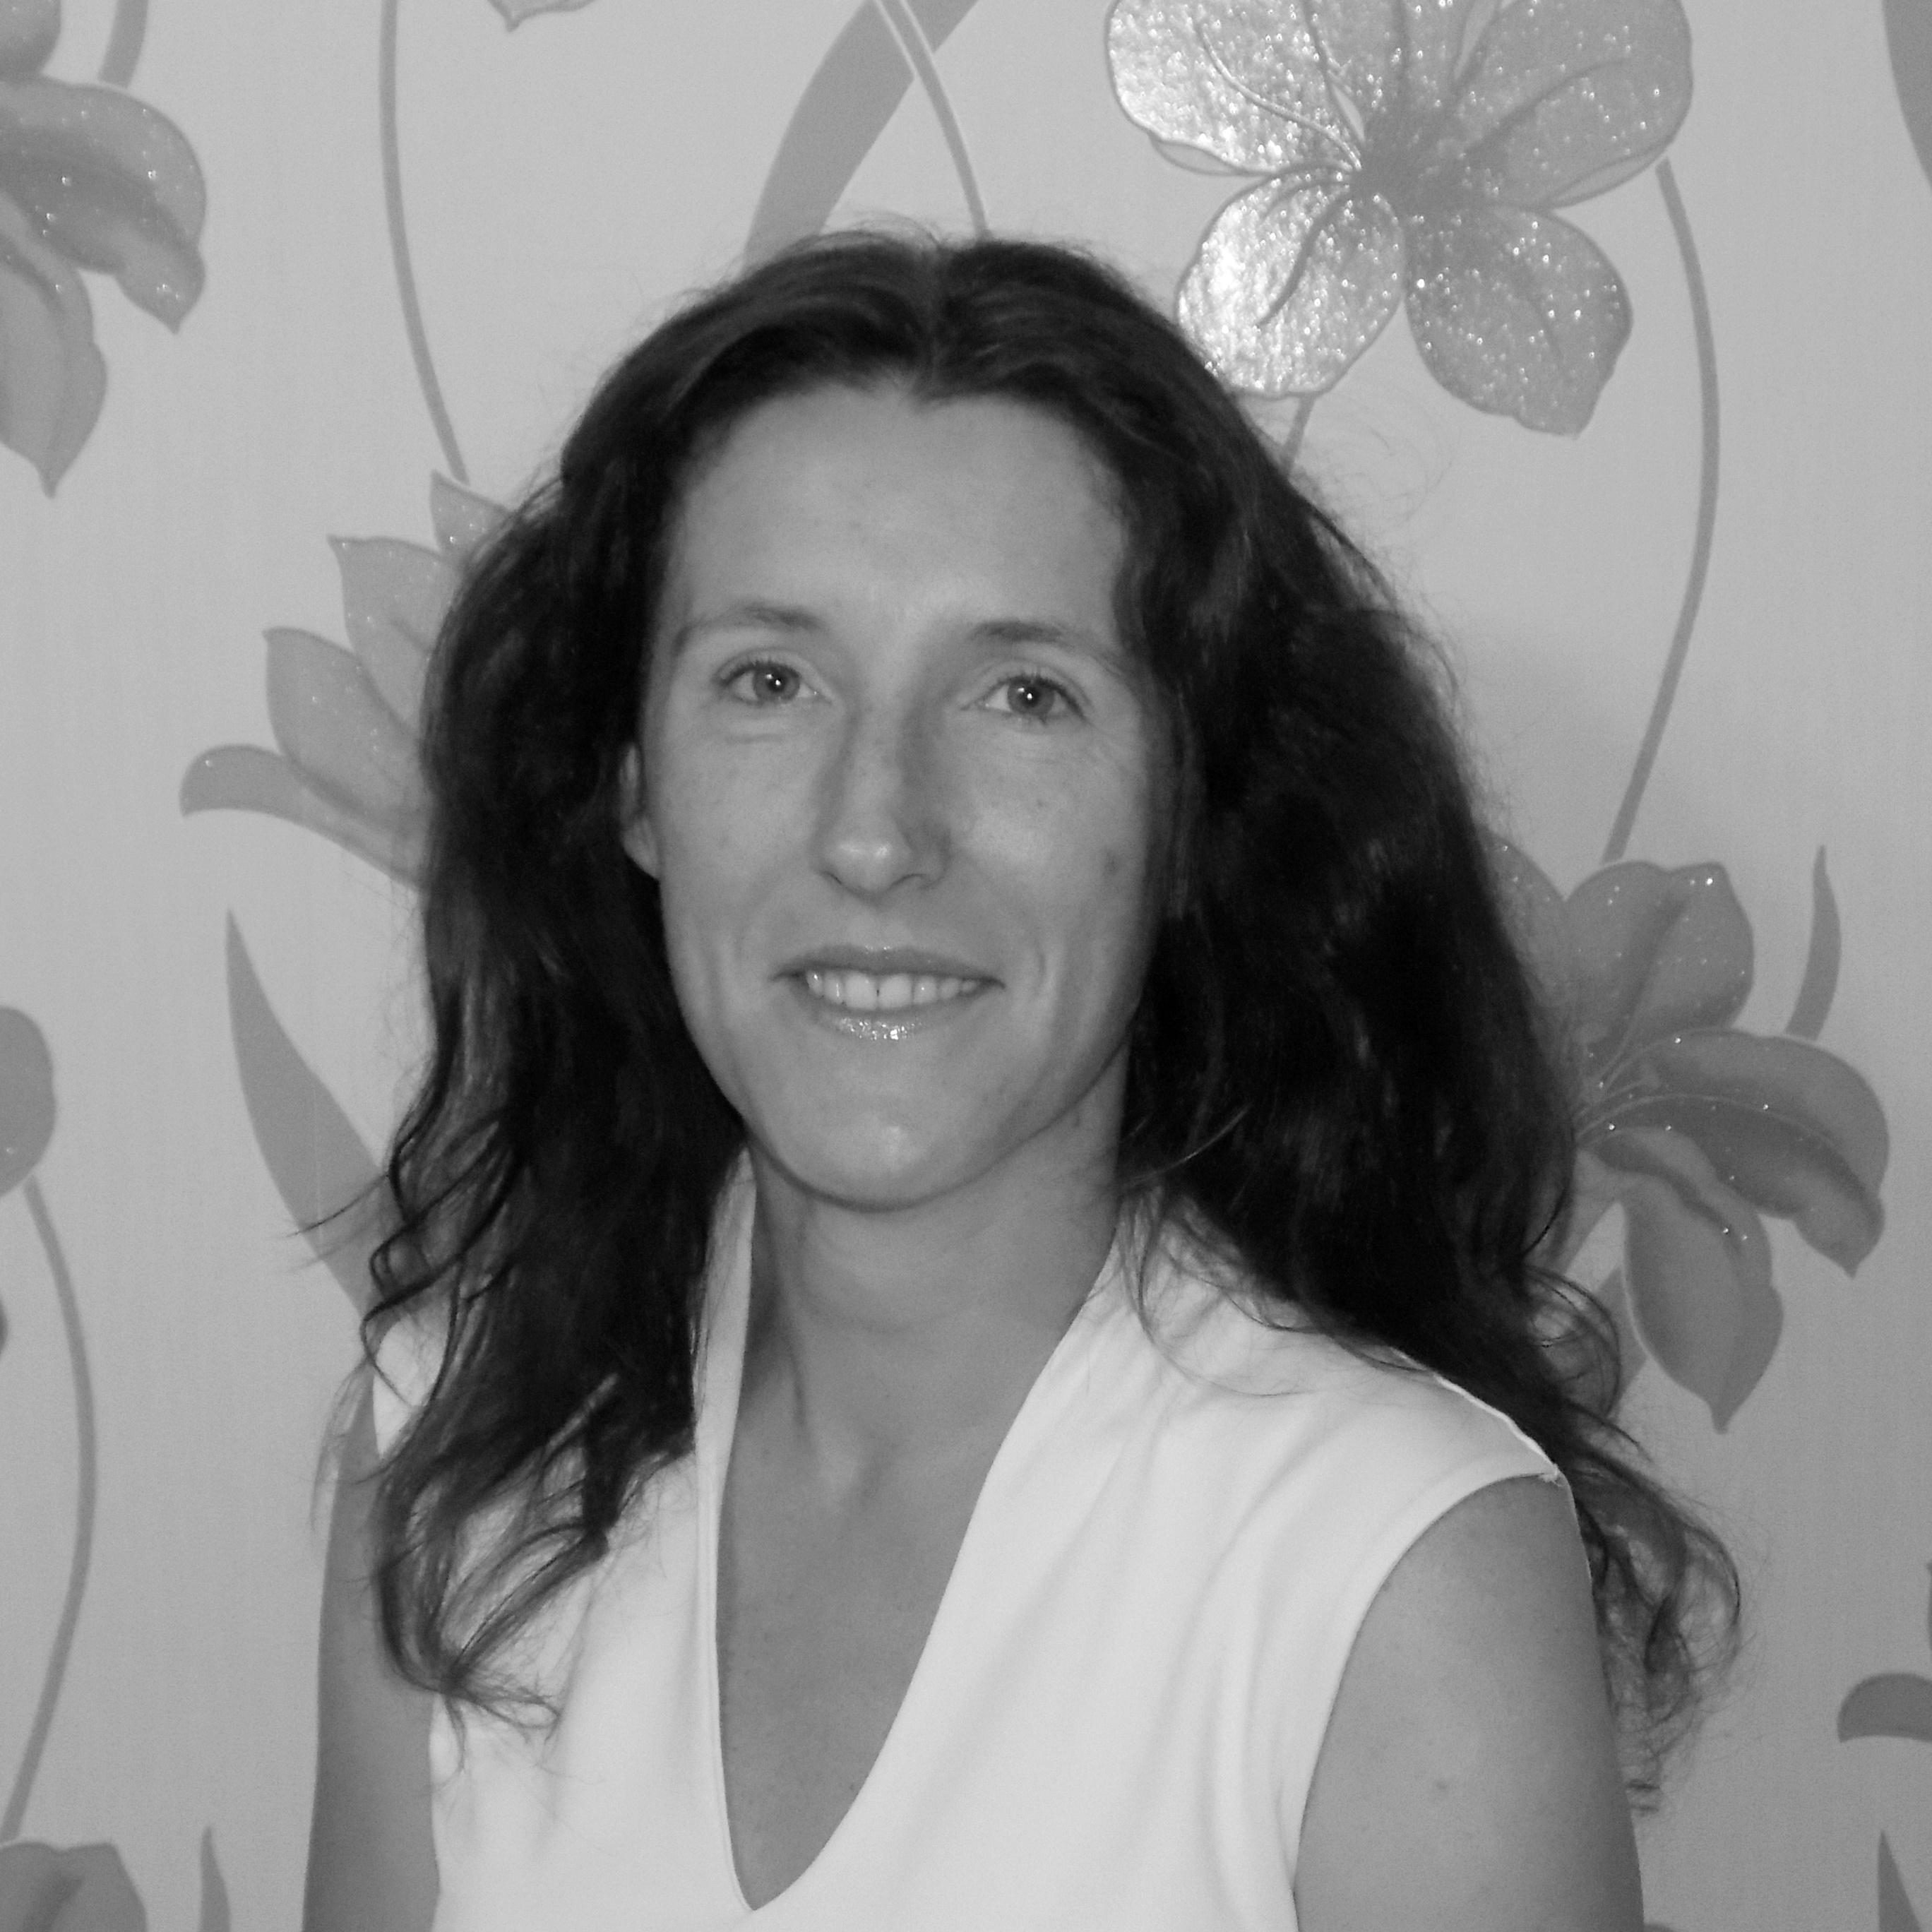 Cristina Maier